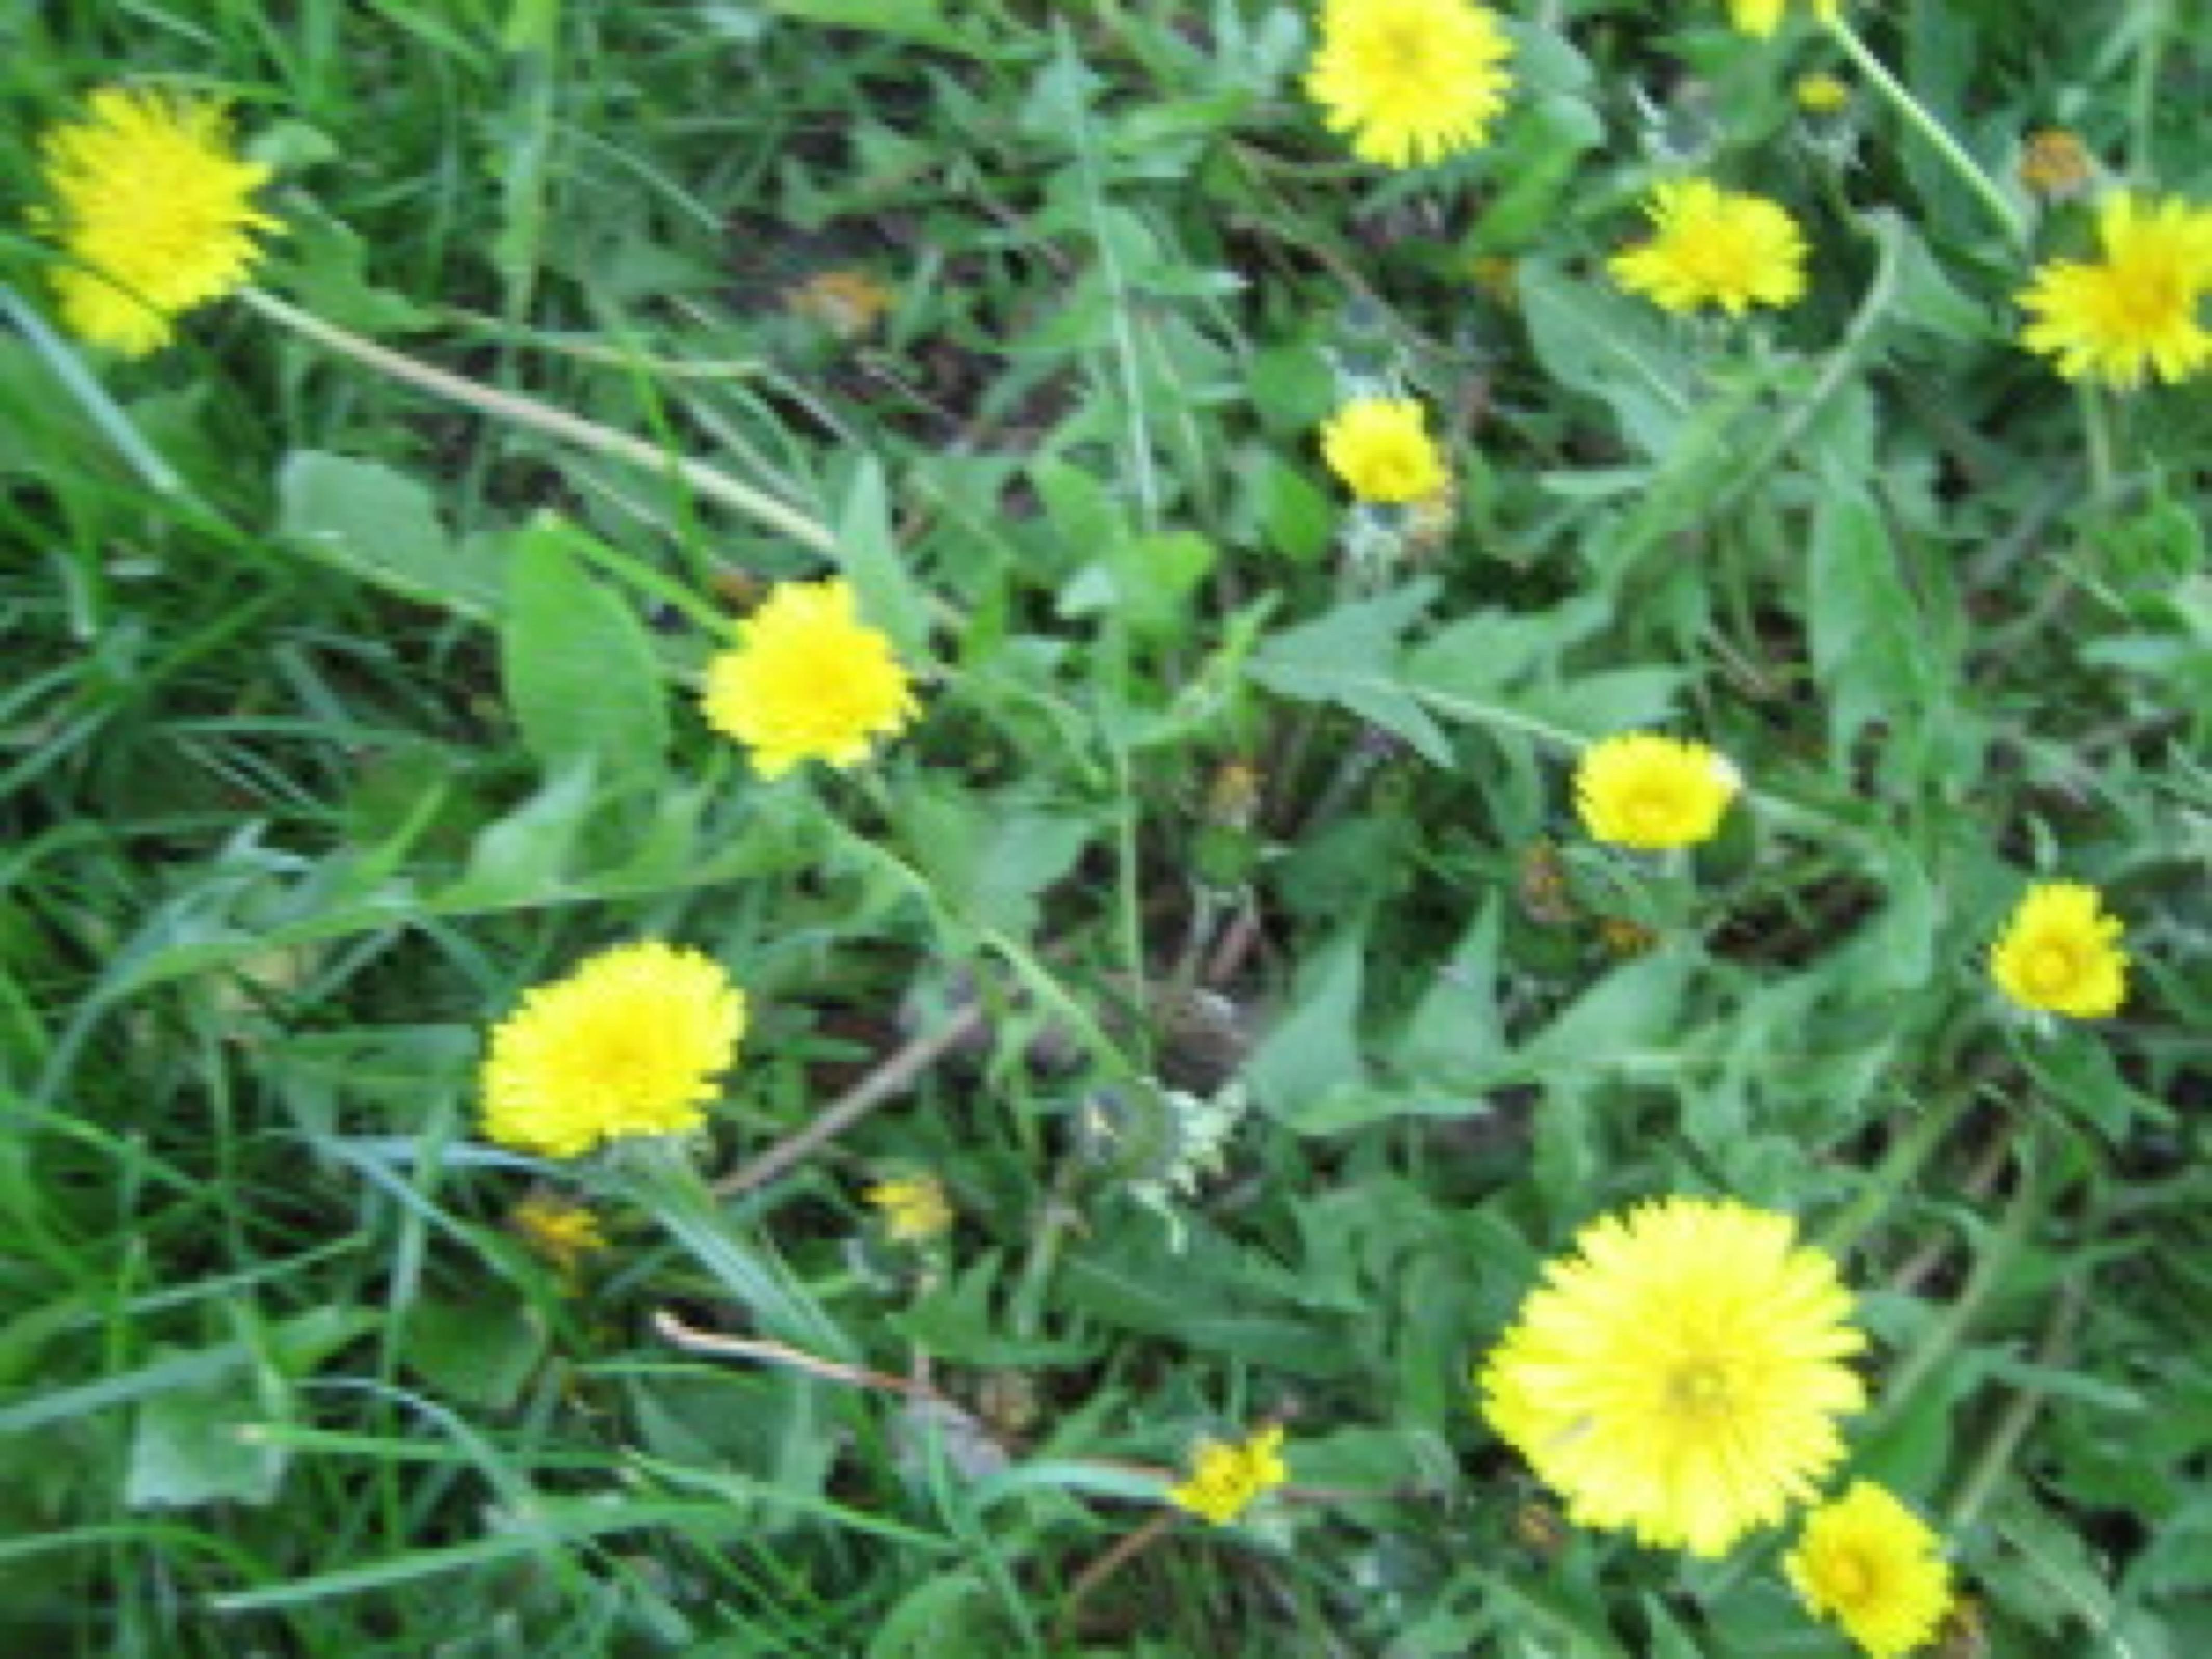 blog image - dandelions and greens